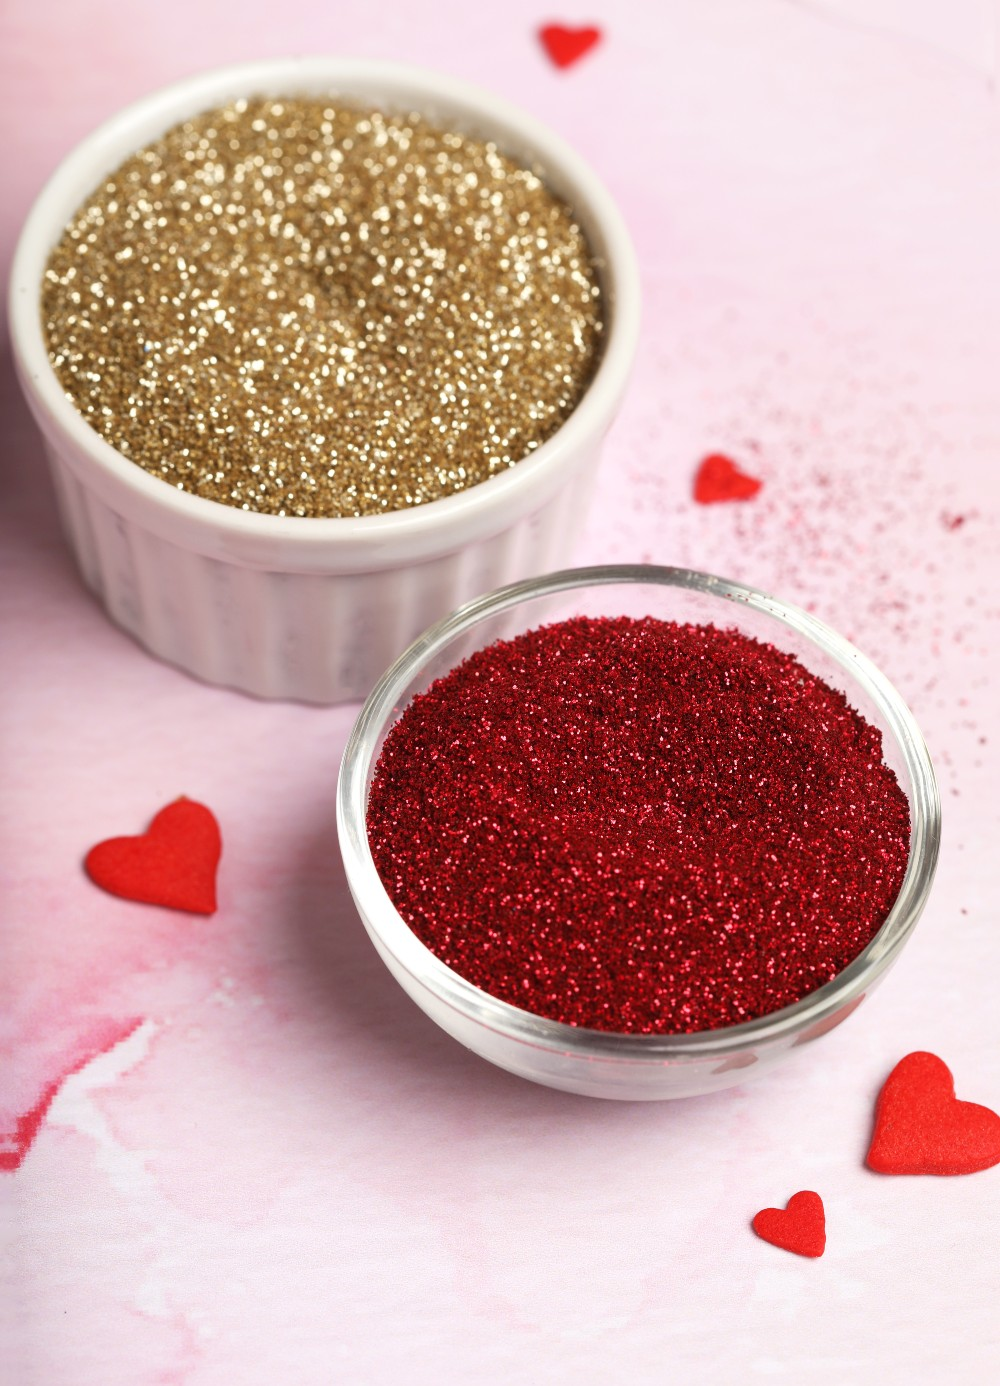 heartfelt collection biodegradable glitters | bramble berry